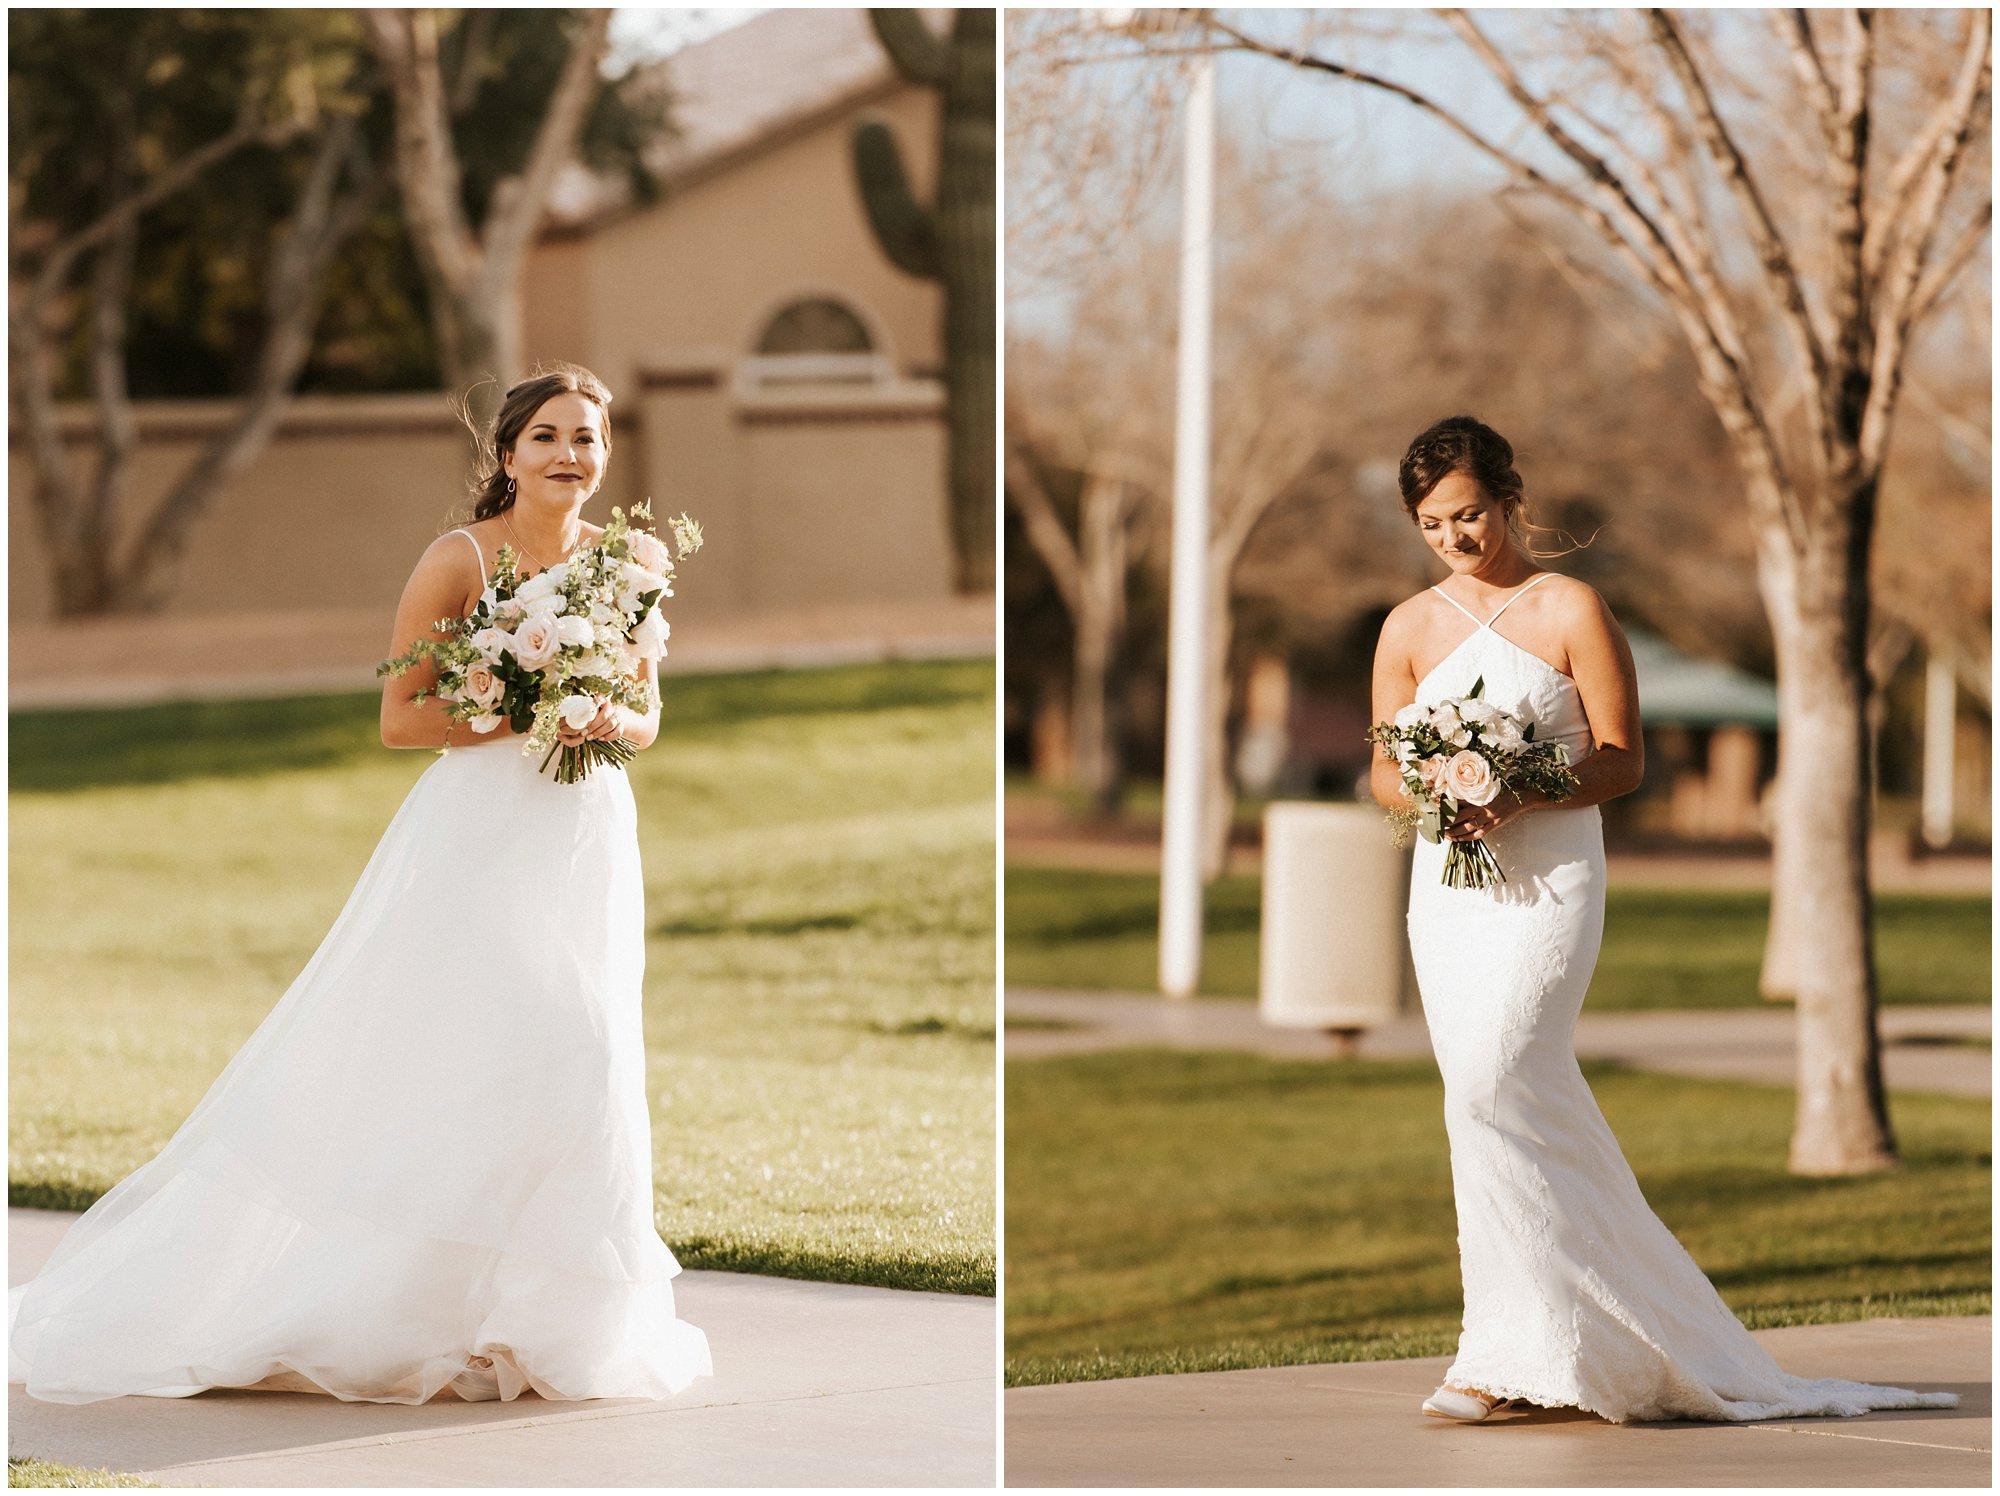 arizona same sex wedding photographer - jenni and lauren wedding the islands clubhouse_0054.jpg